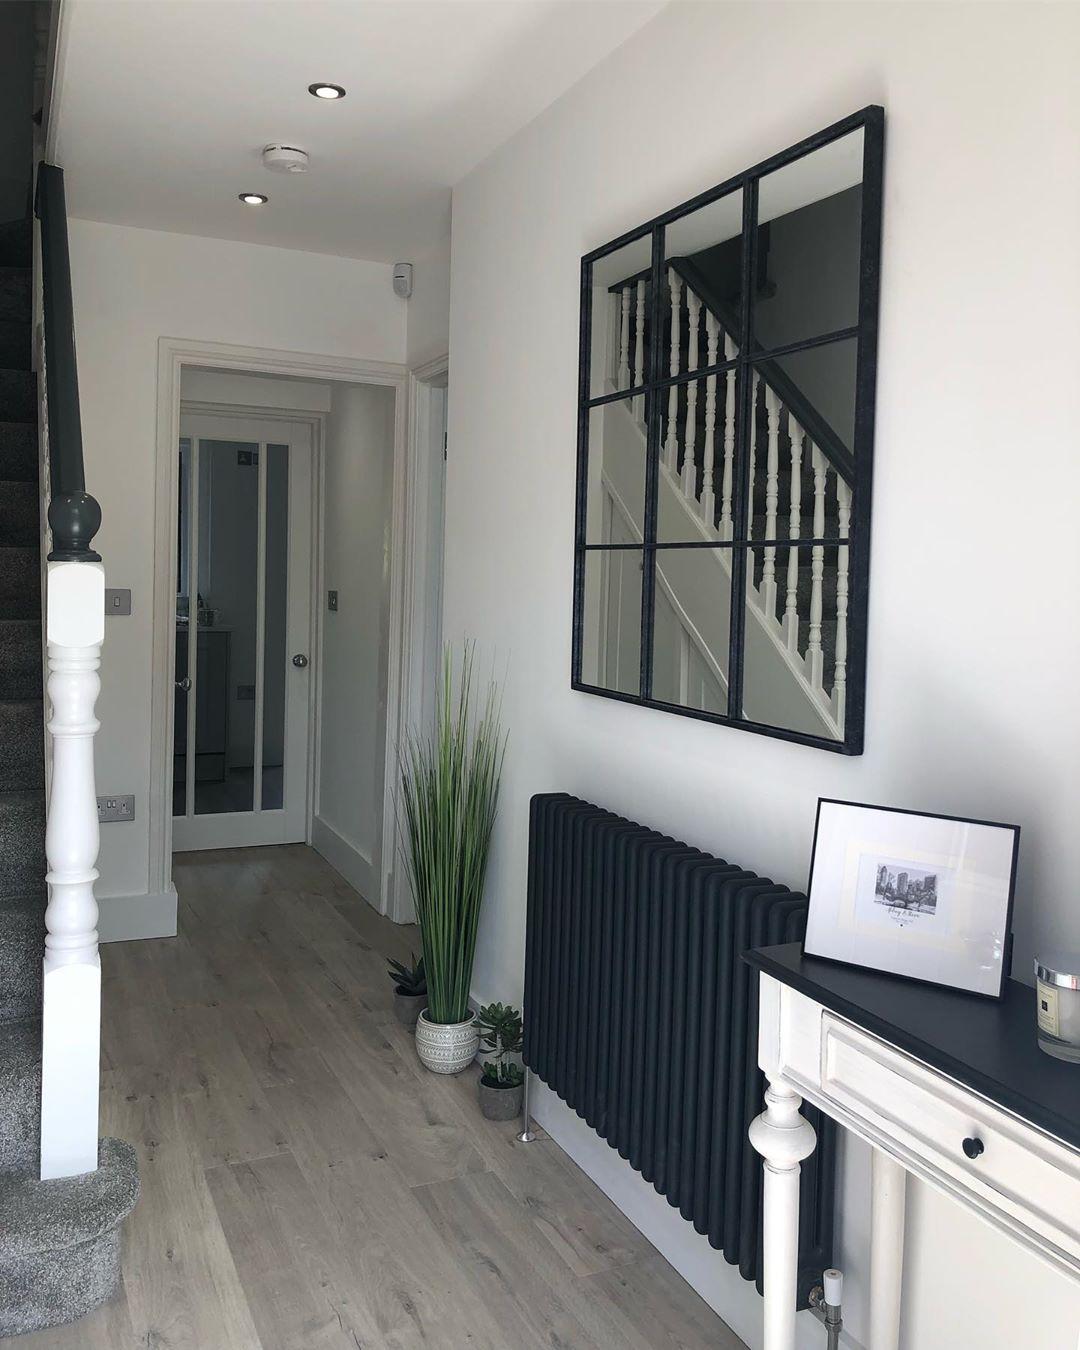 Milano Windsor column radiator in a modern hallway